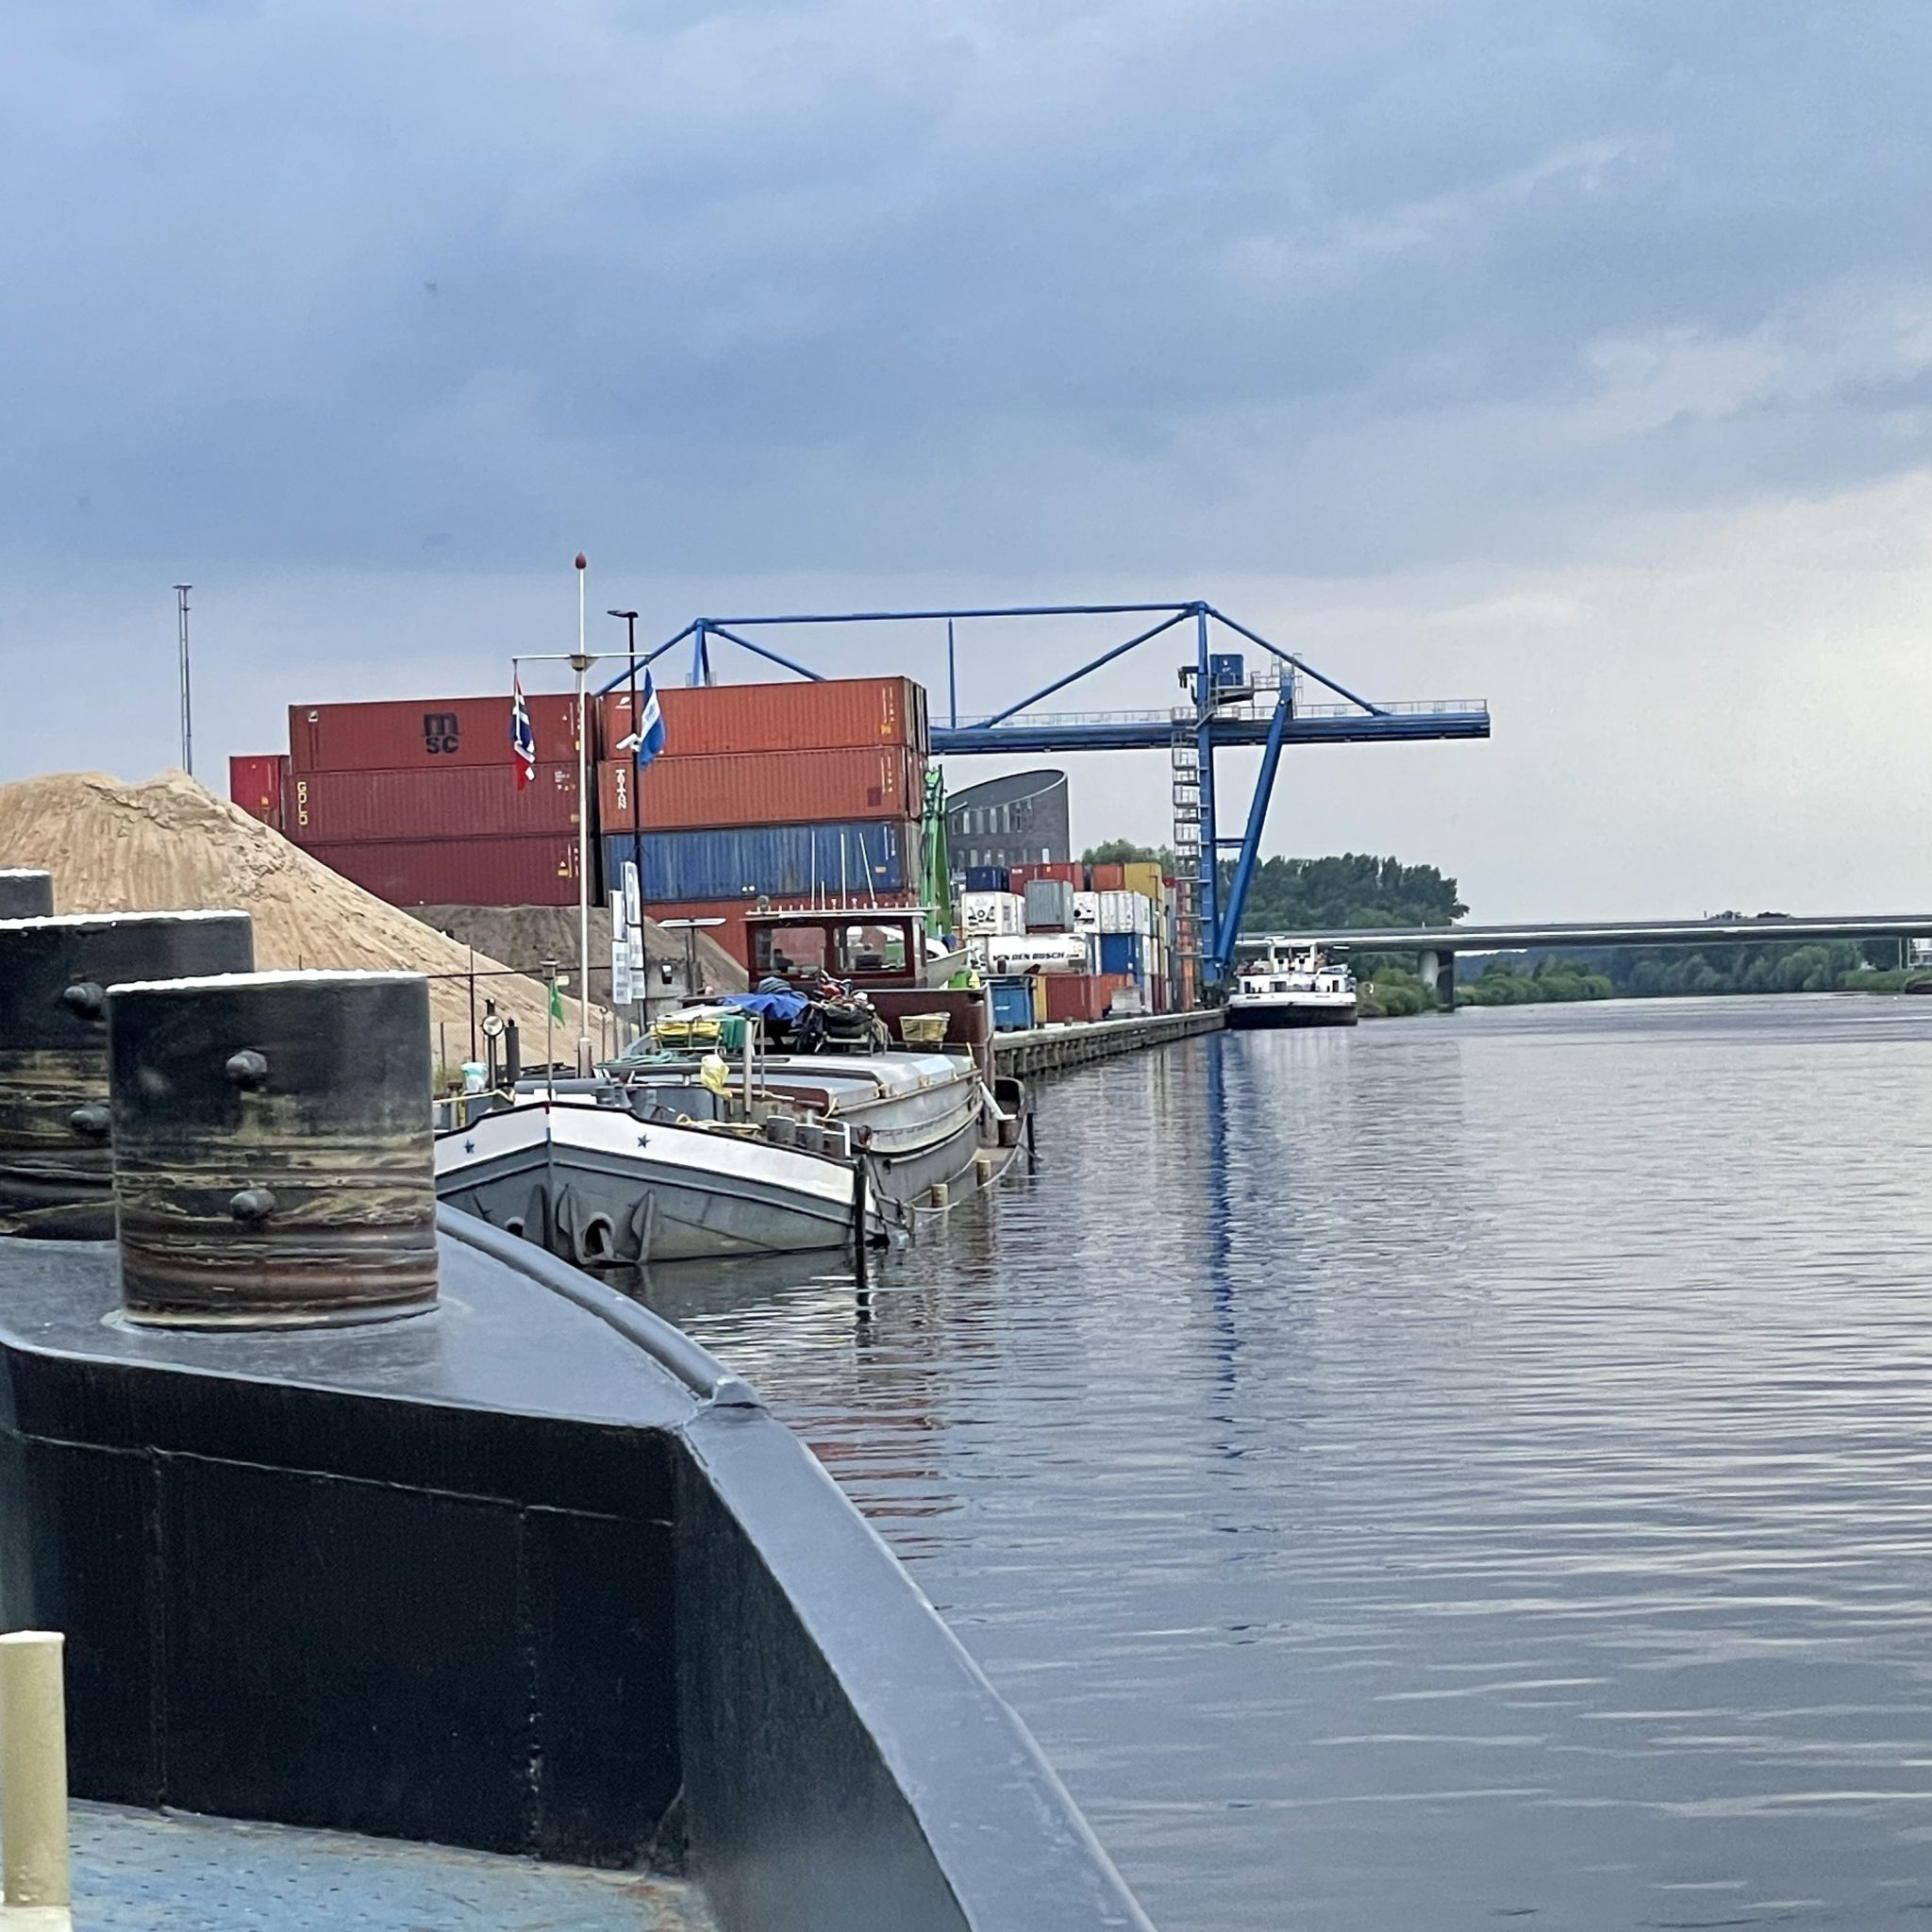 De Semper Spera ligt bij Veghel op de Zuid-Willemsvaart sinds dinsdagavond 27 juli. (Foto AS Media)